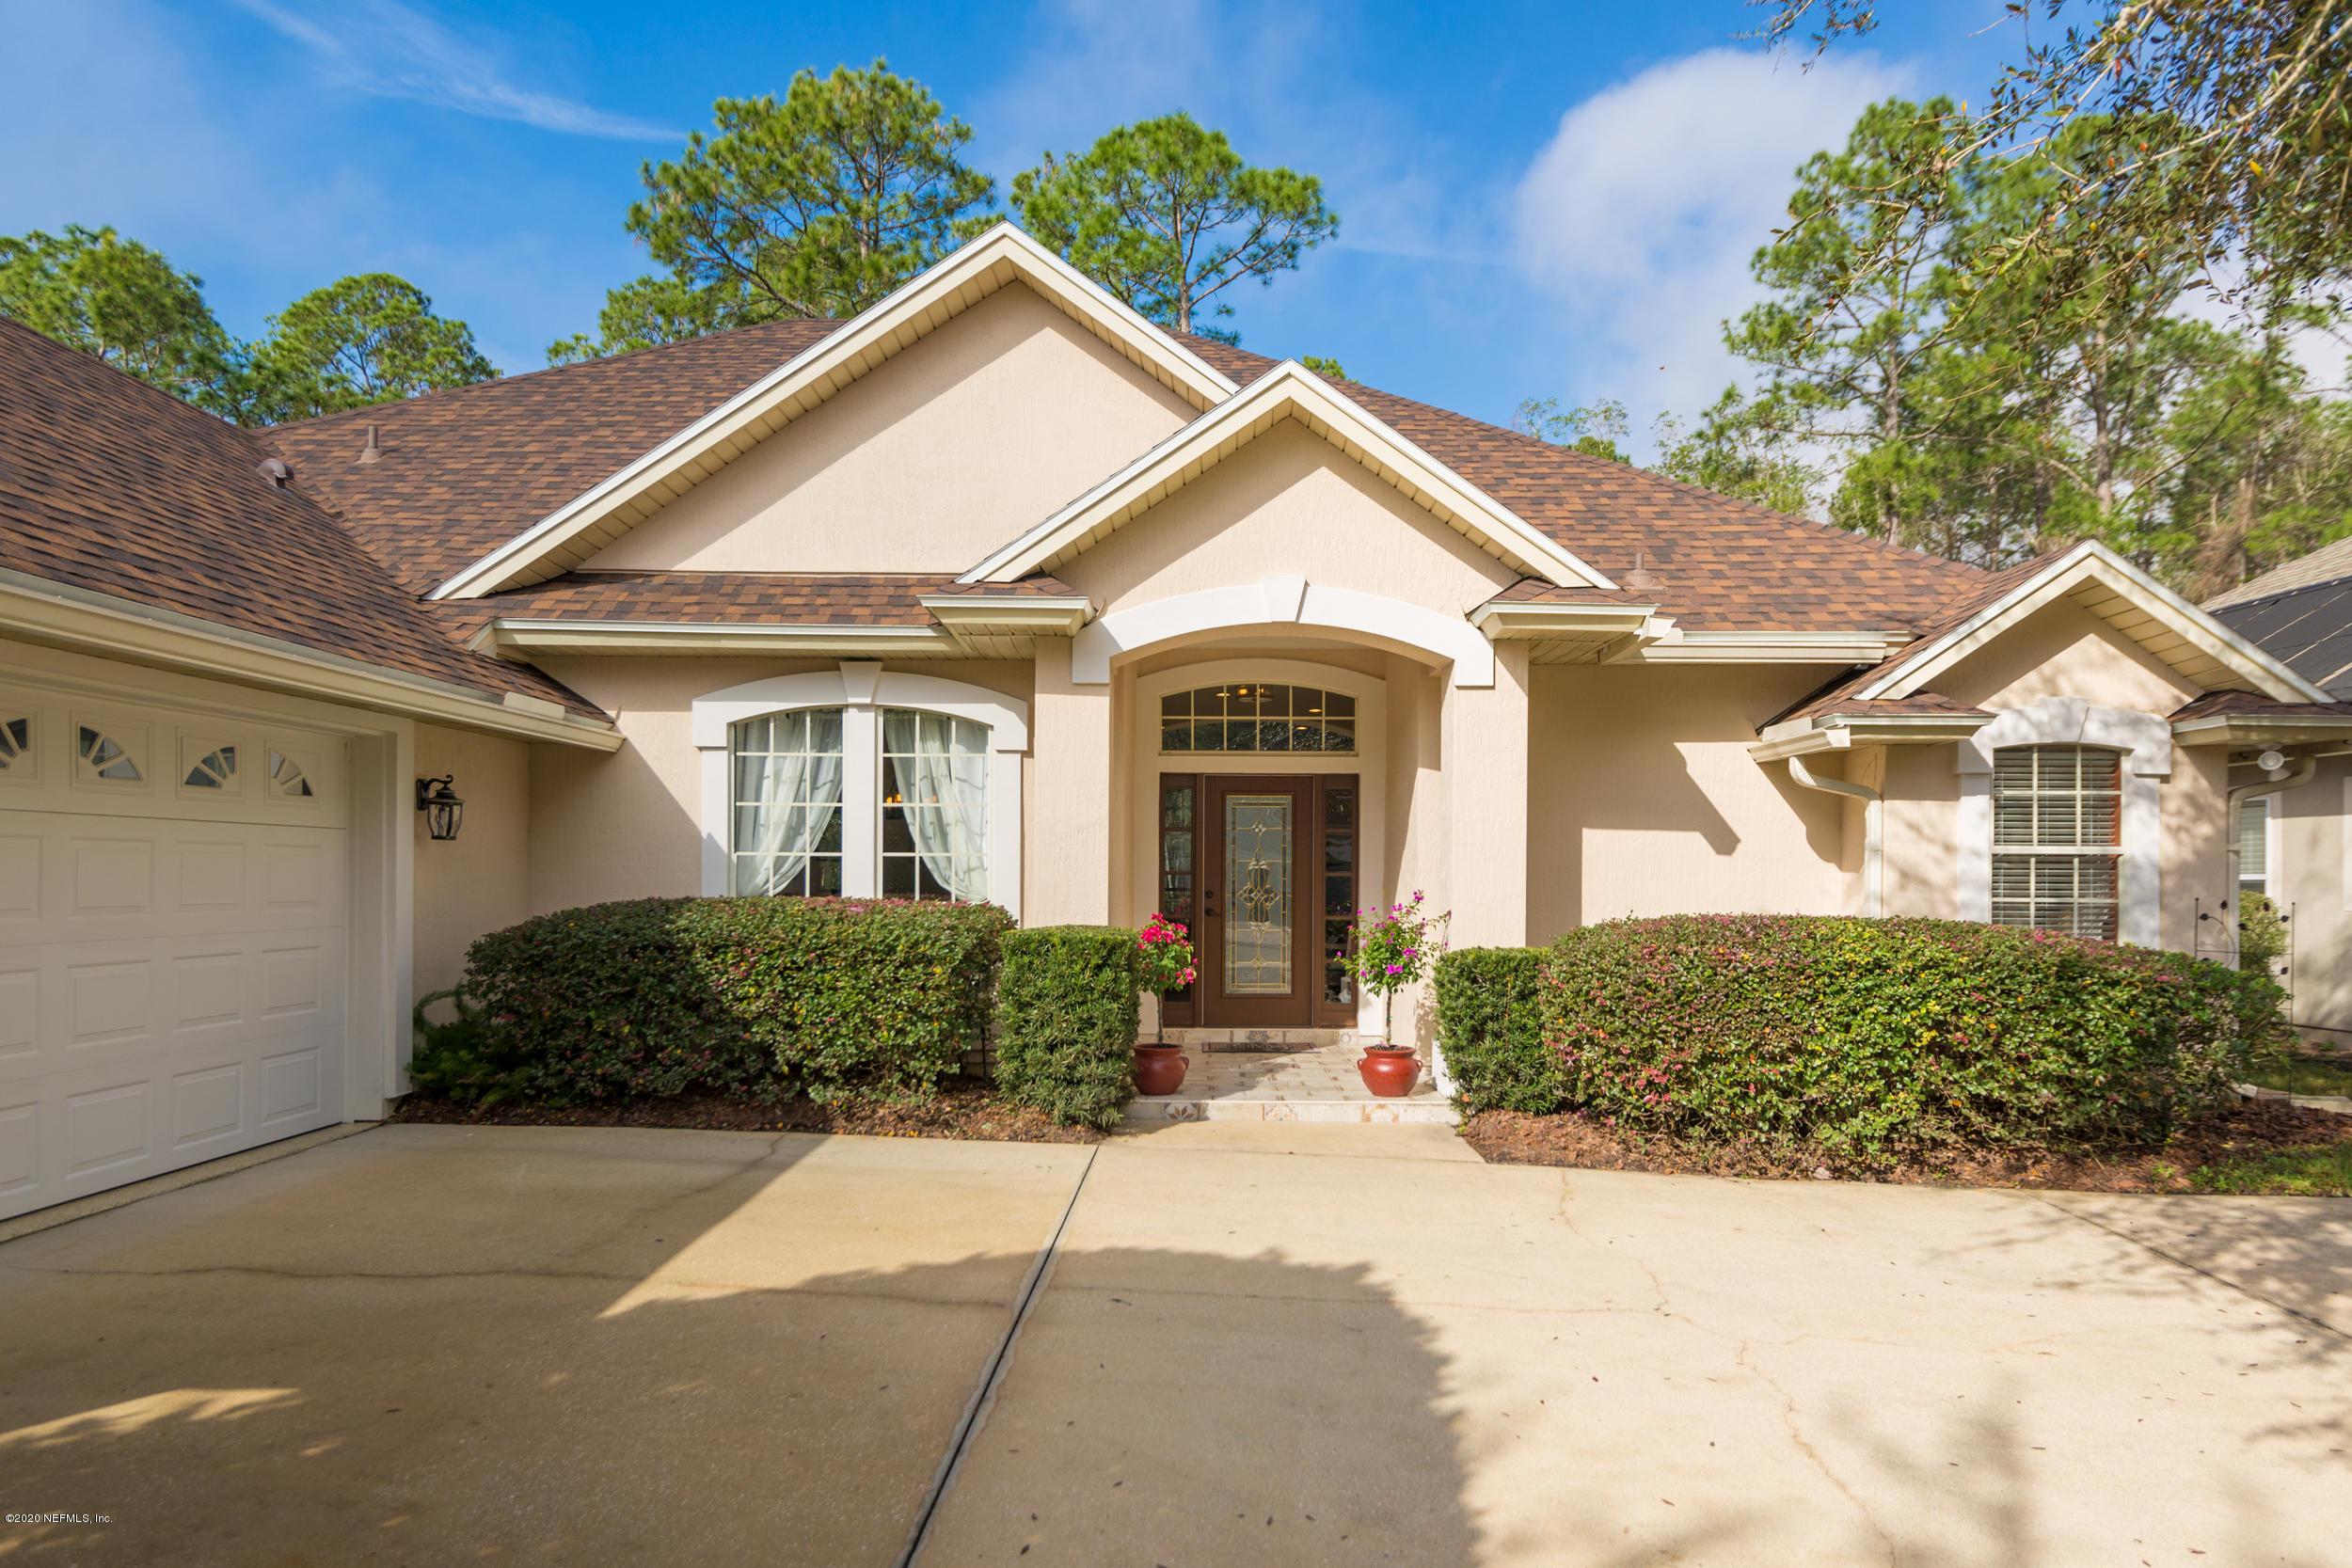 3761 BERENSTAIN, ST AUGUSTINE, FLORIDA 32092, 4 Bedrooms Bedrooms, ,3 BathroomsBathrooms,Residential,For sale,BERENSTAIN,1033847